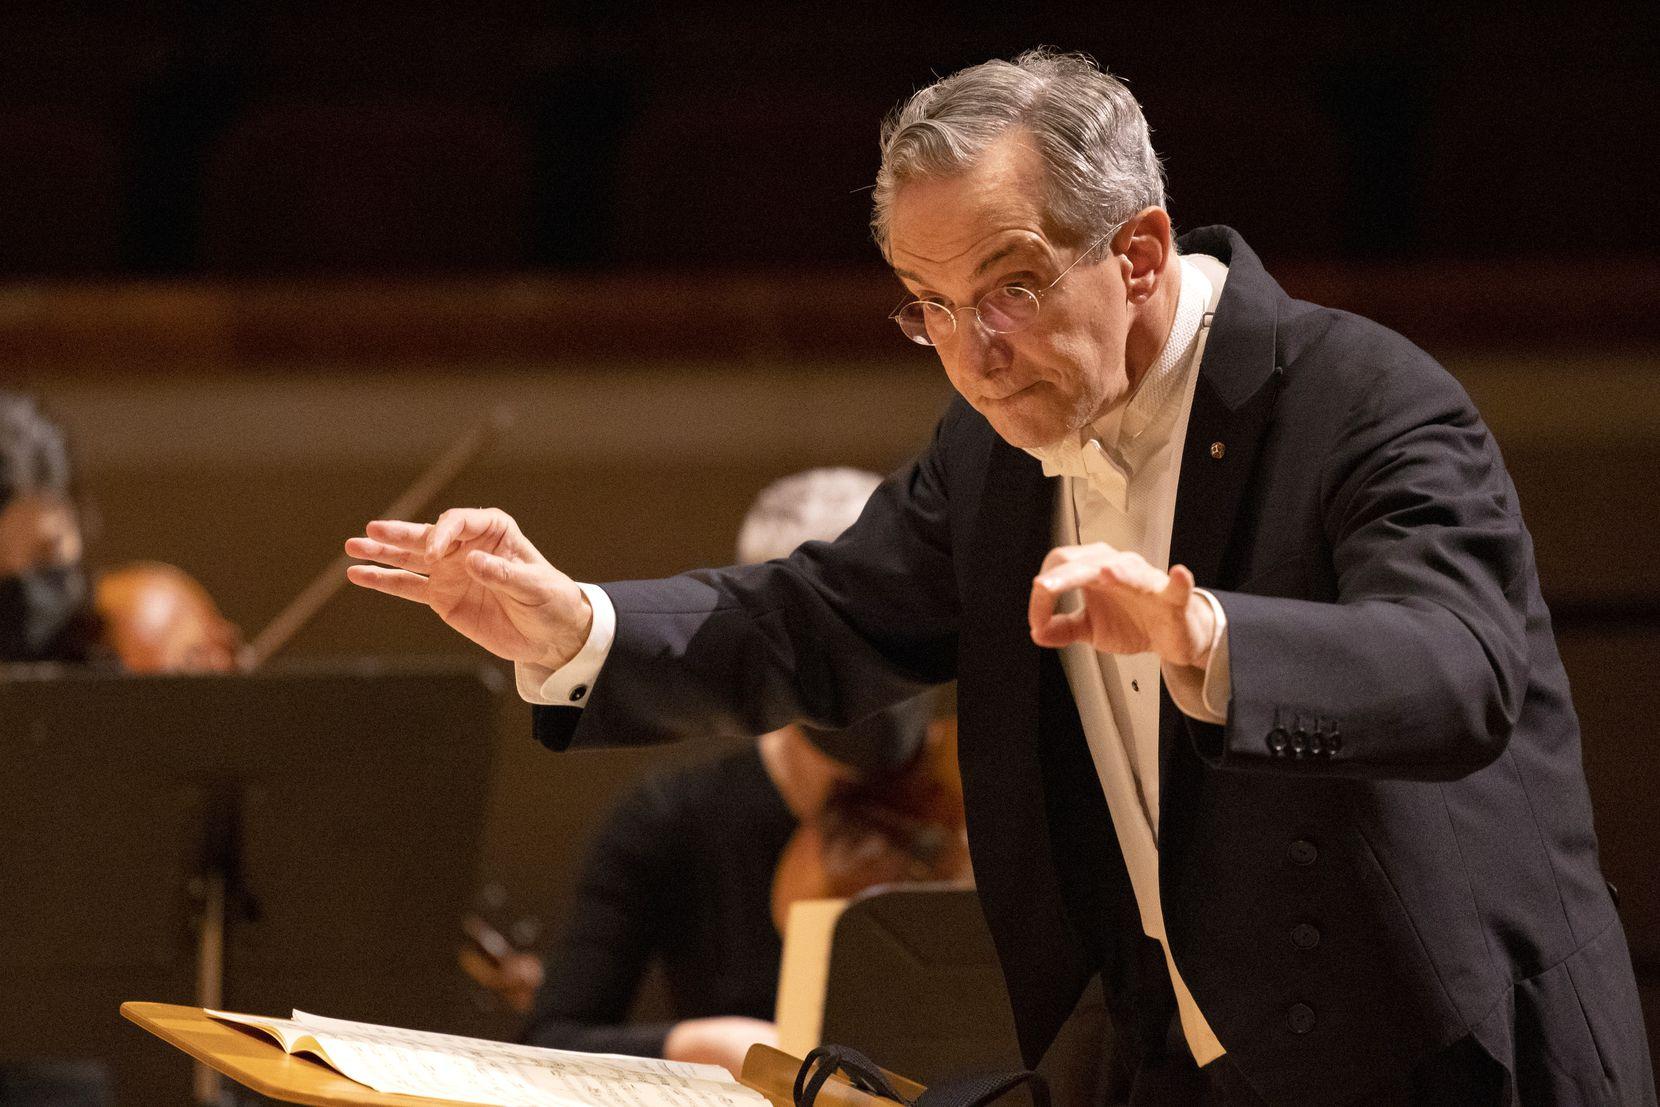 Music director Fabio Luisi leads the Dallas Symphony Orchestra in Mozart's Adagio and Fugue in C minor, K. 546.